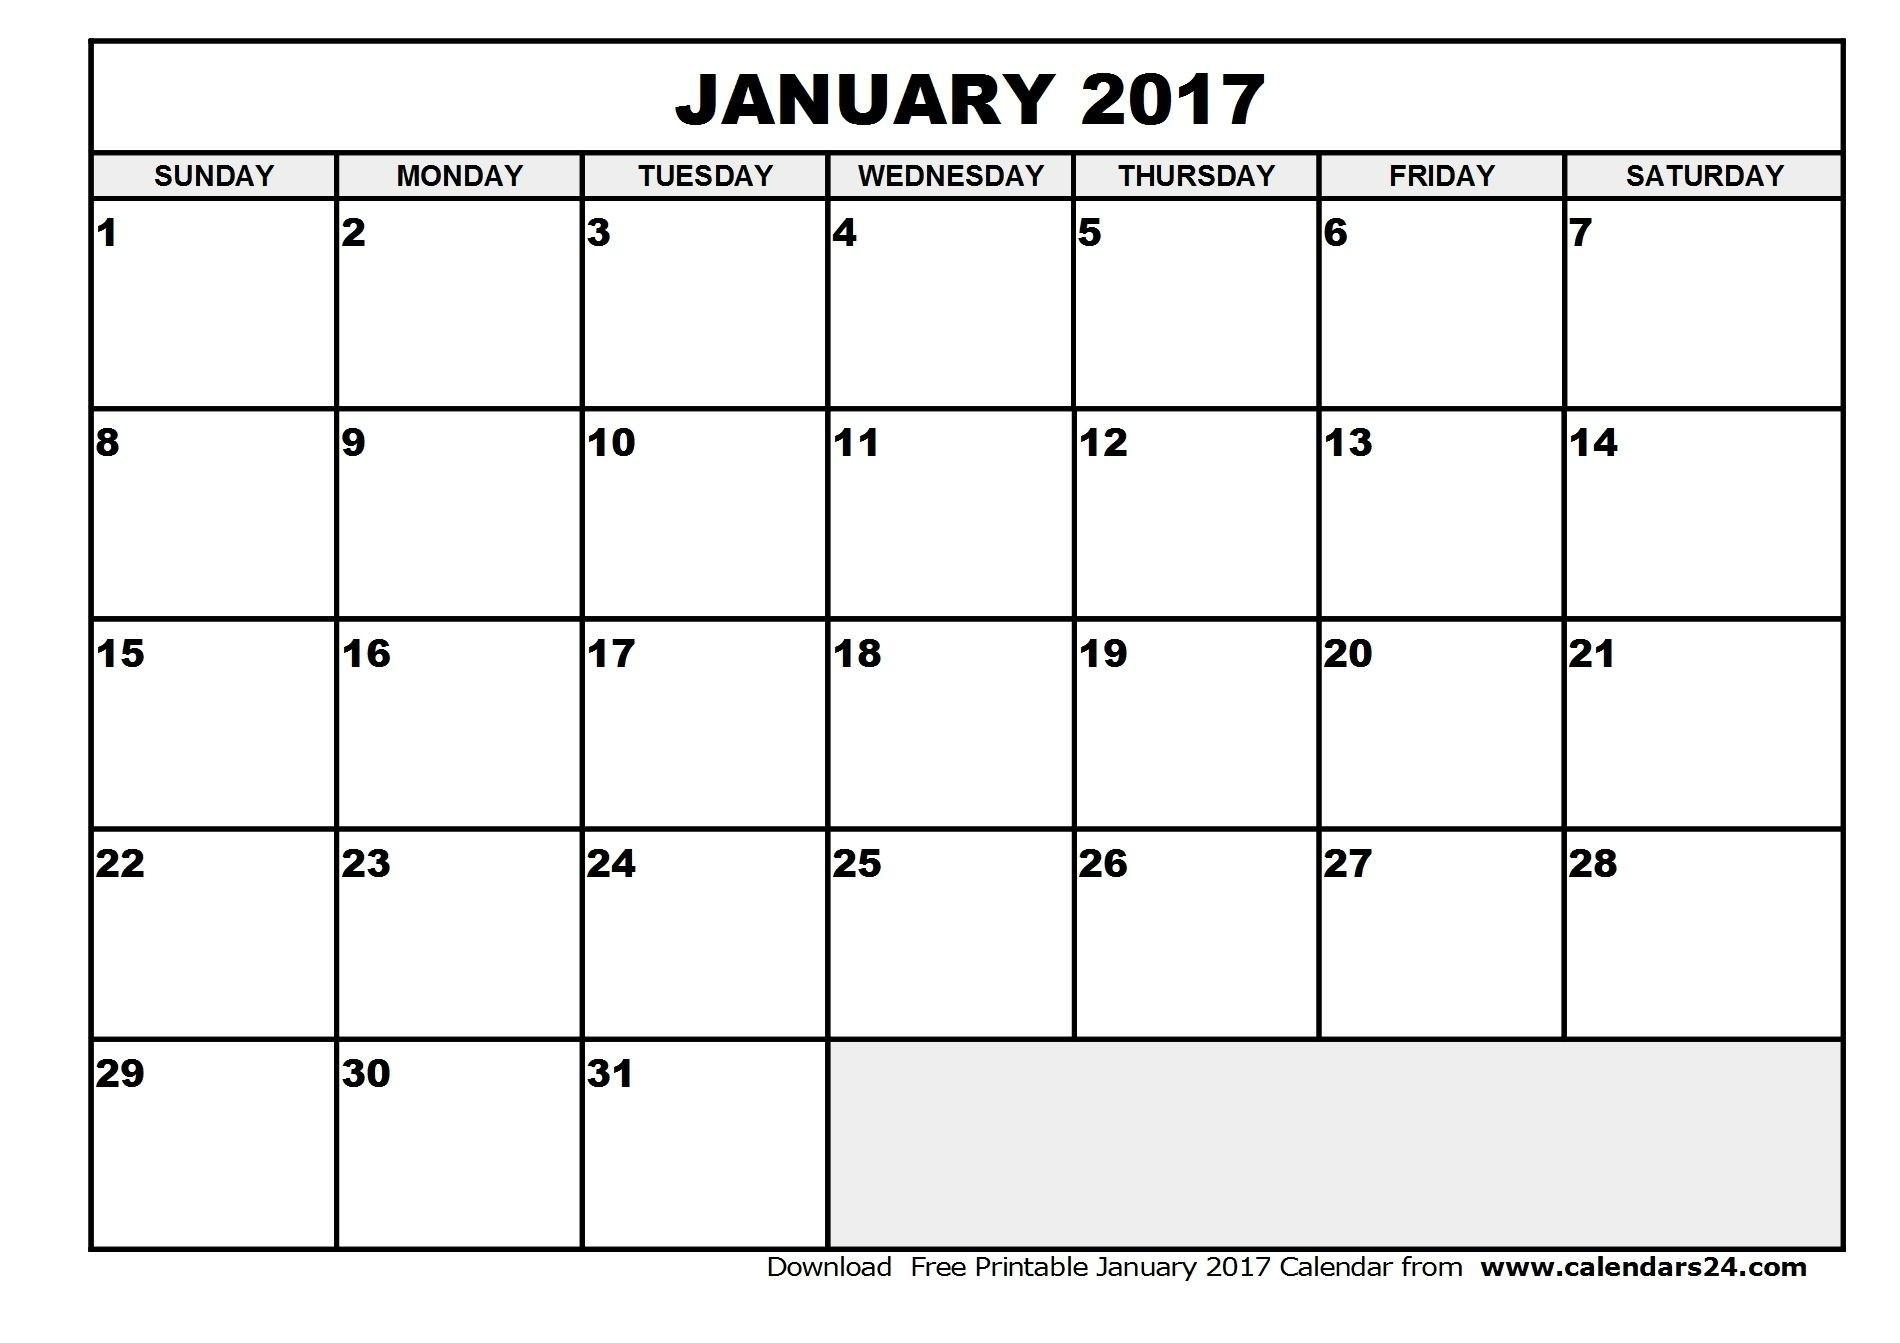 Printable Calendar Month Of August019 | Jazz Gear inside August Printable Calendar By Month